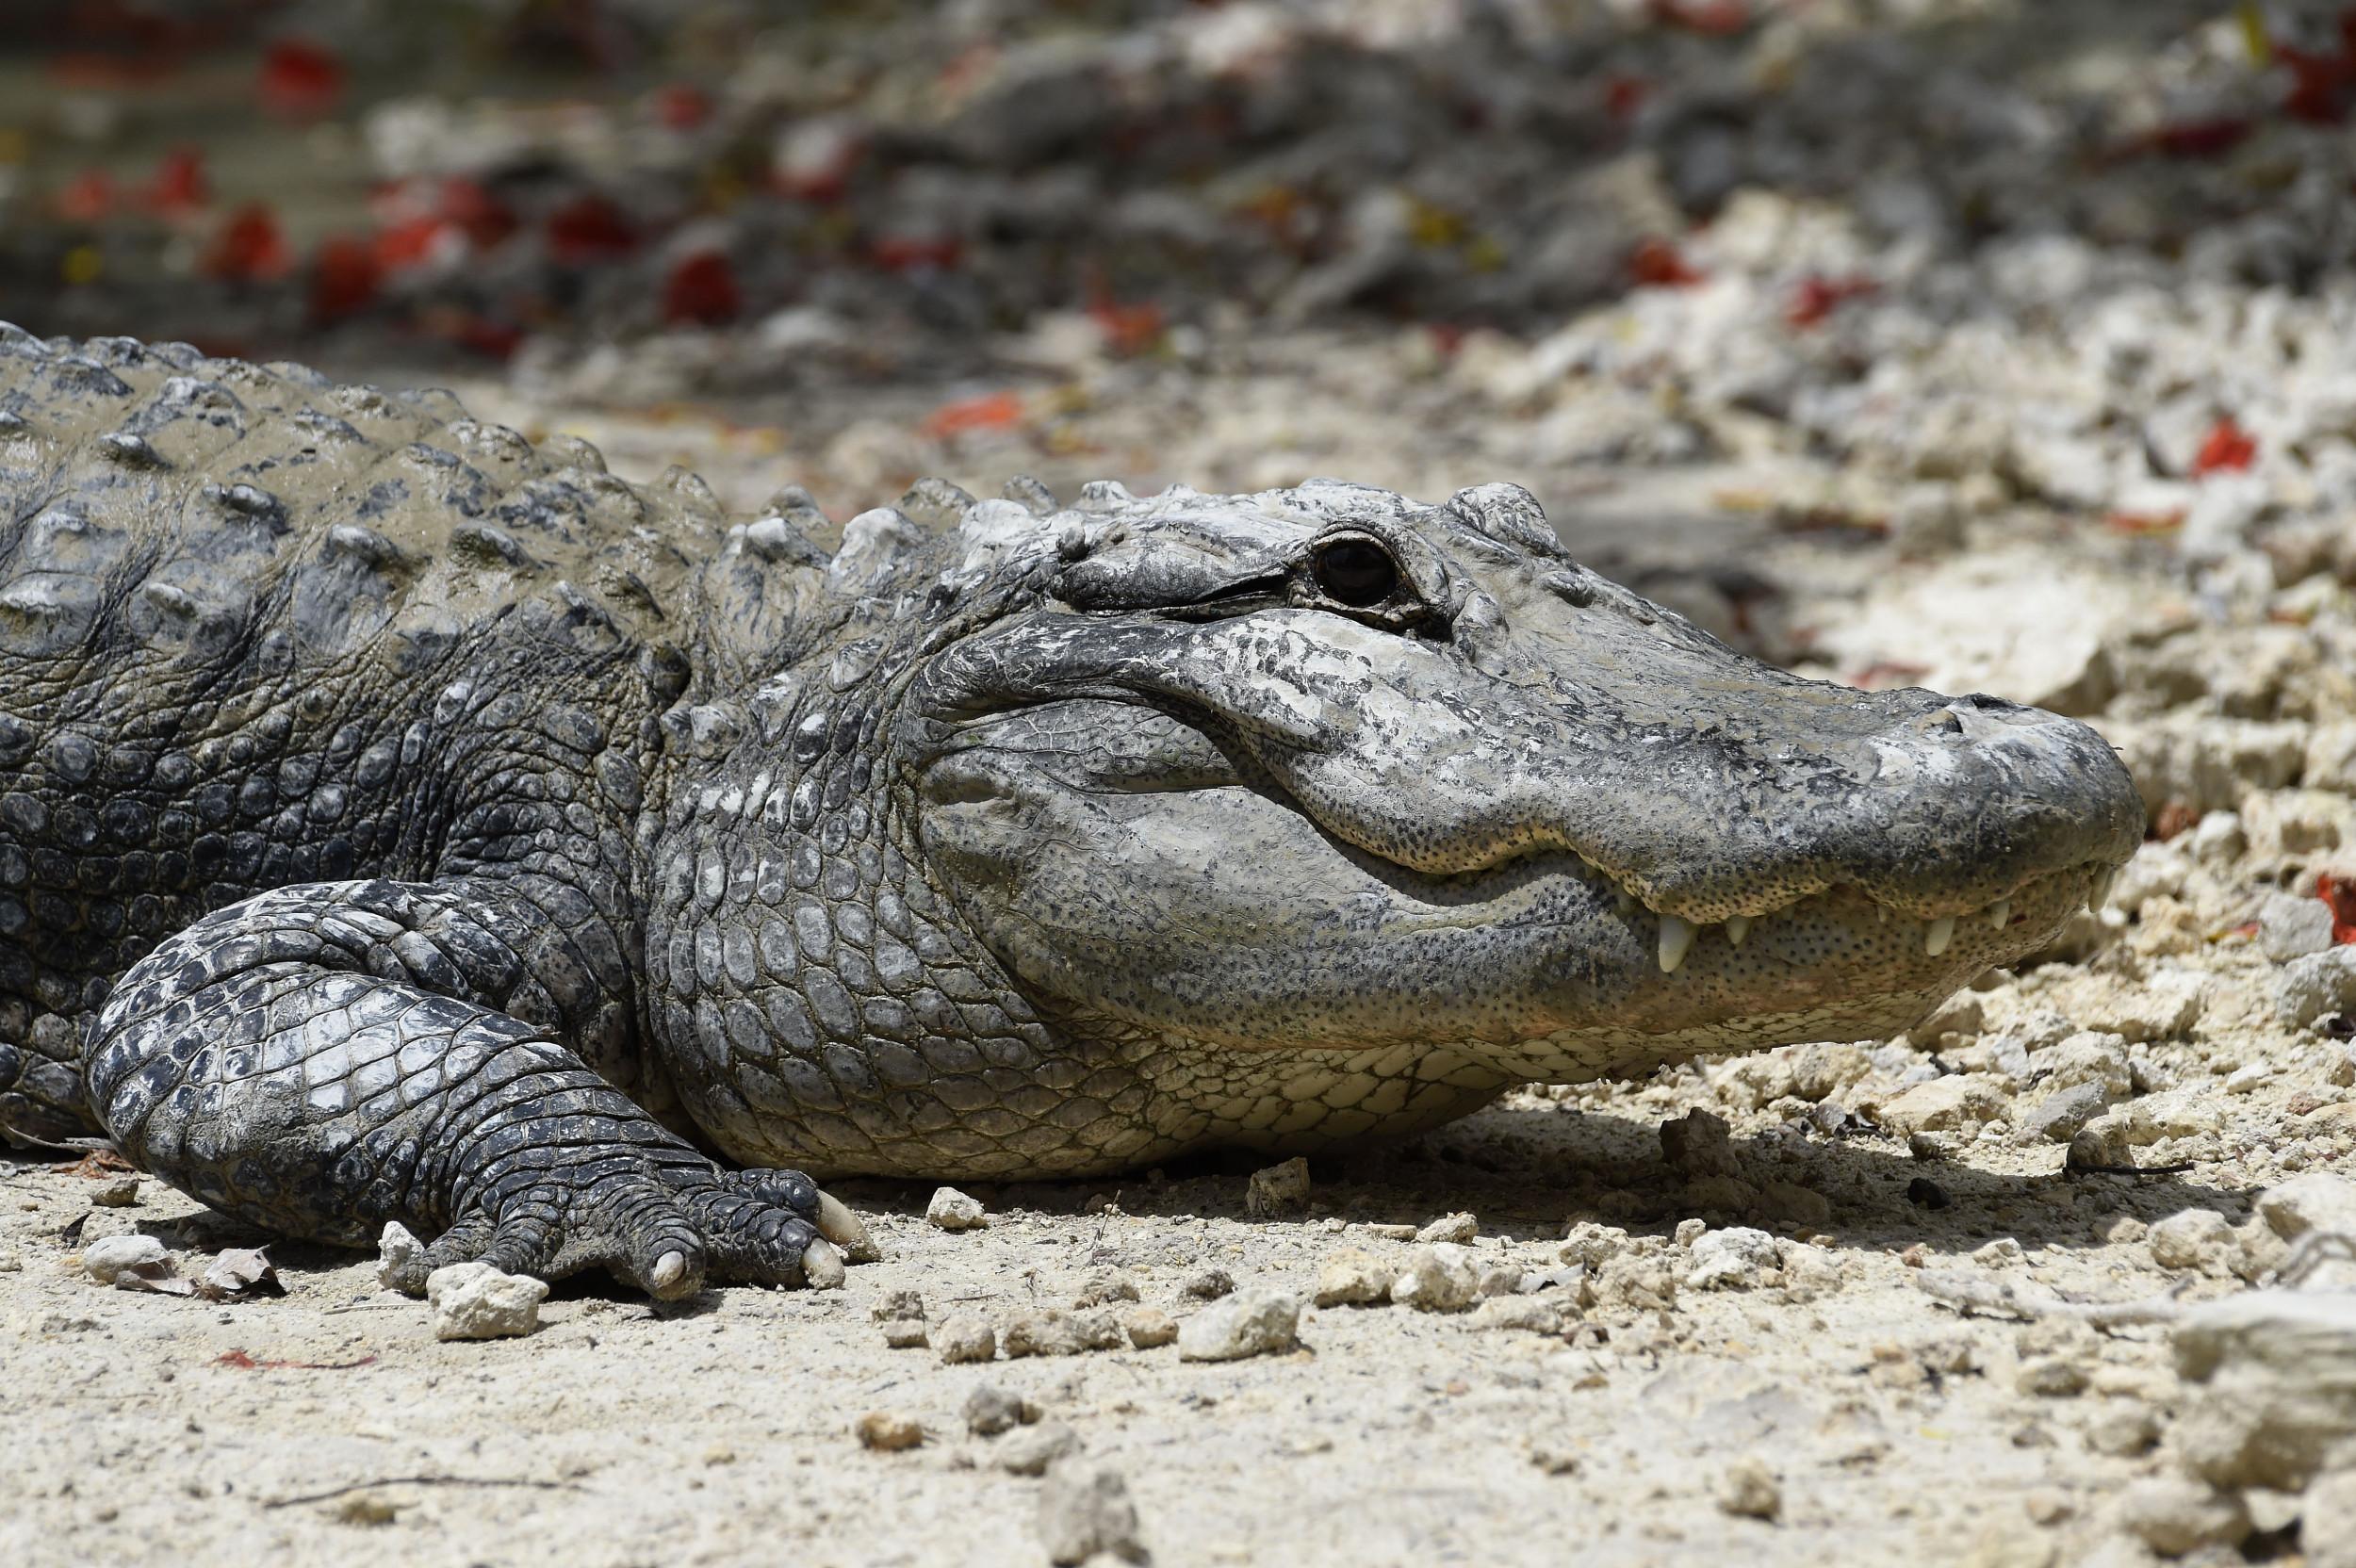 8a30acd3 Alligator Filmed Swimming in the Ocean Off Florida Beach in Rare ...